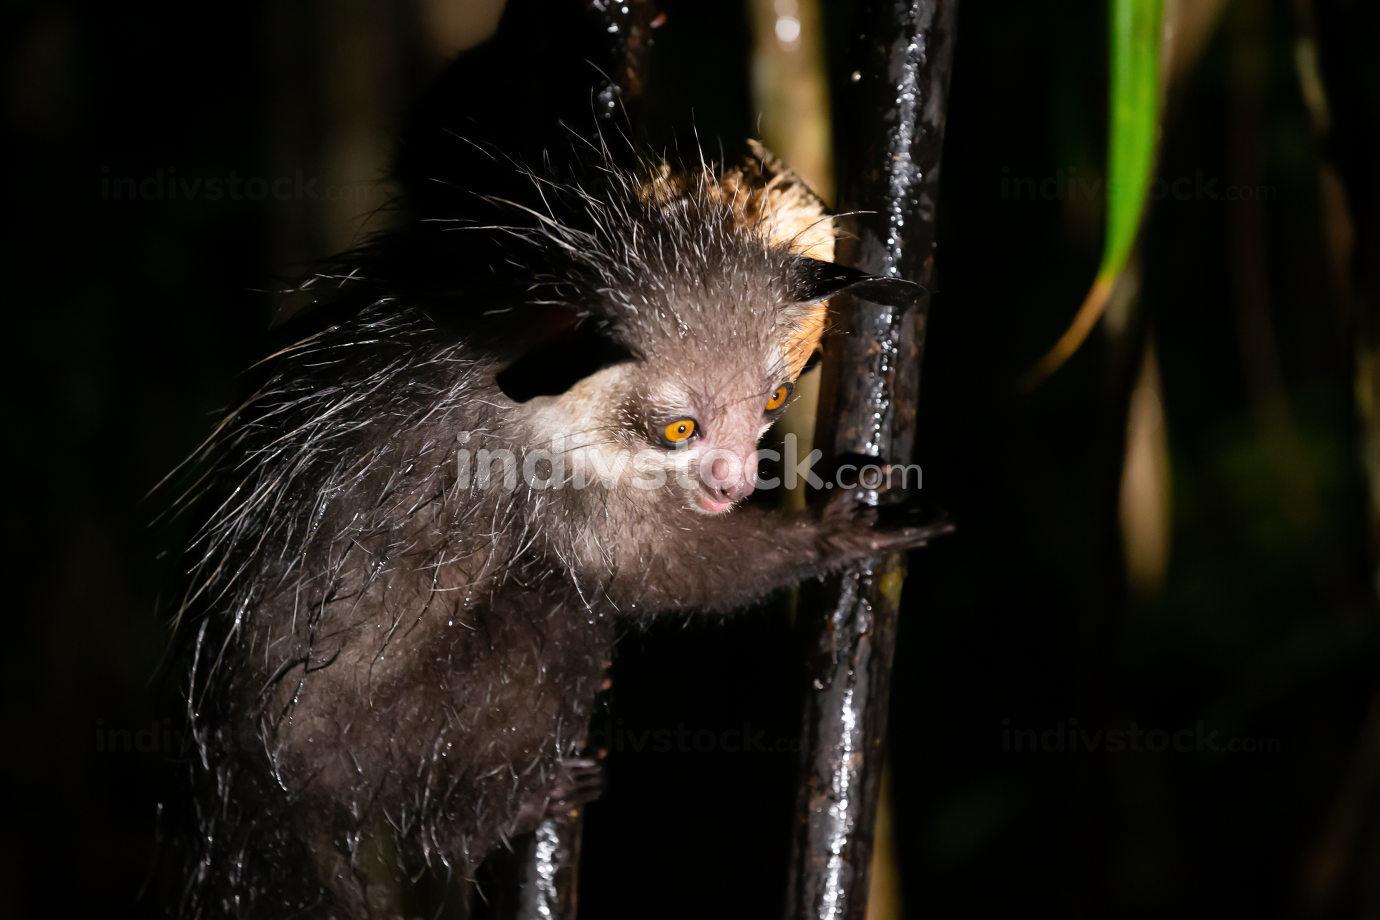 The rare aye-aye lemur when it rains